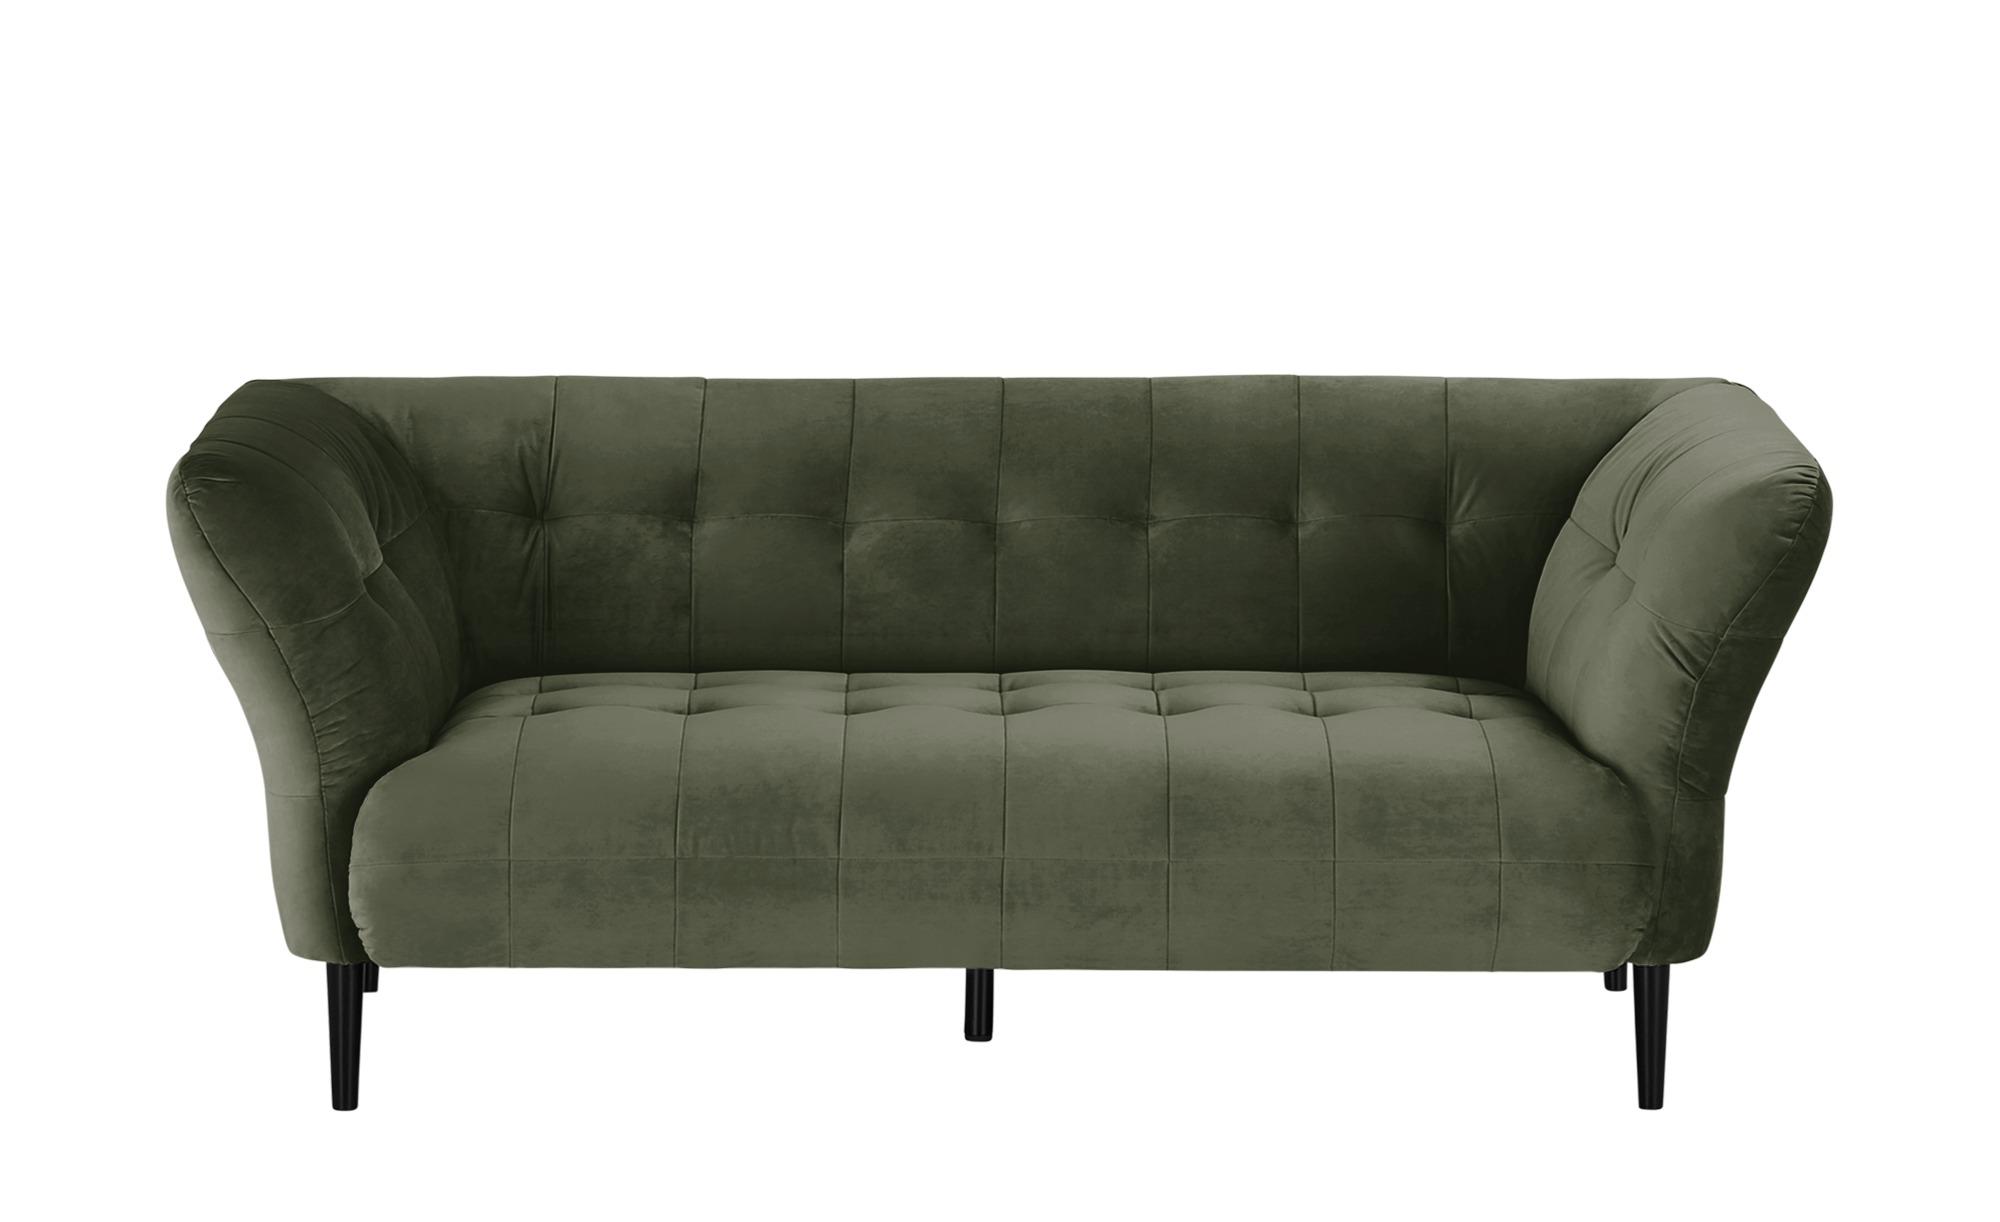 Sofa  Puccini ¦ grün ¦ Maße (cm): B: 200 H: 79 T: 97 Polstermöbel > Sofas > 2-Sitzer - Höffner